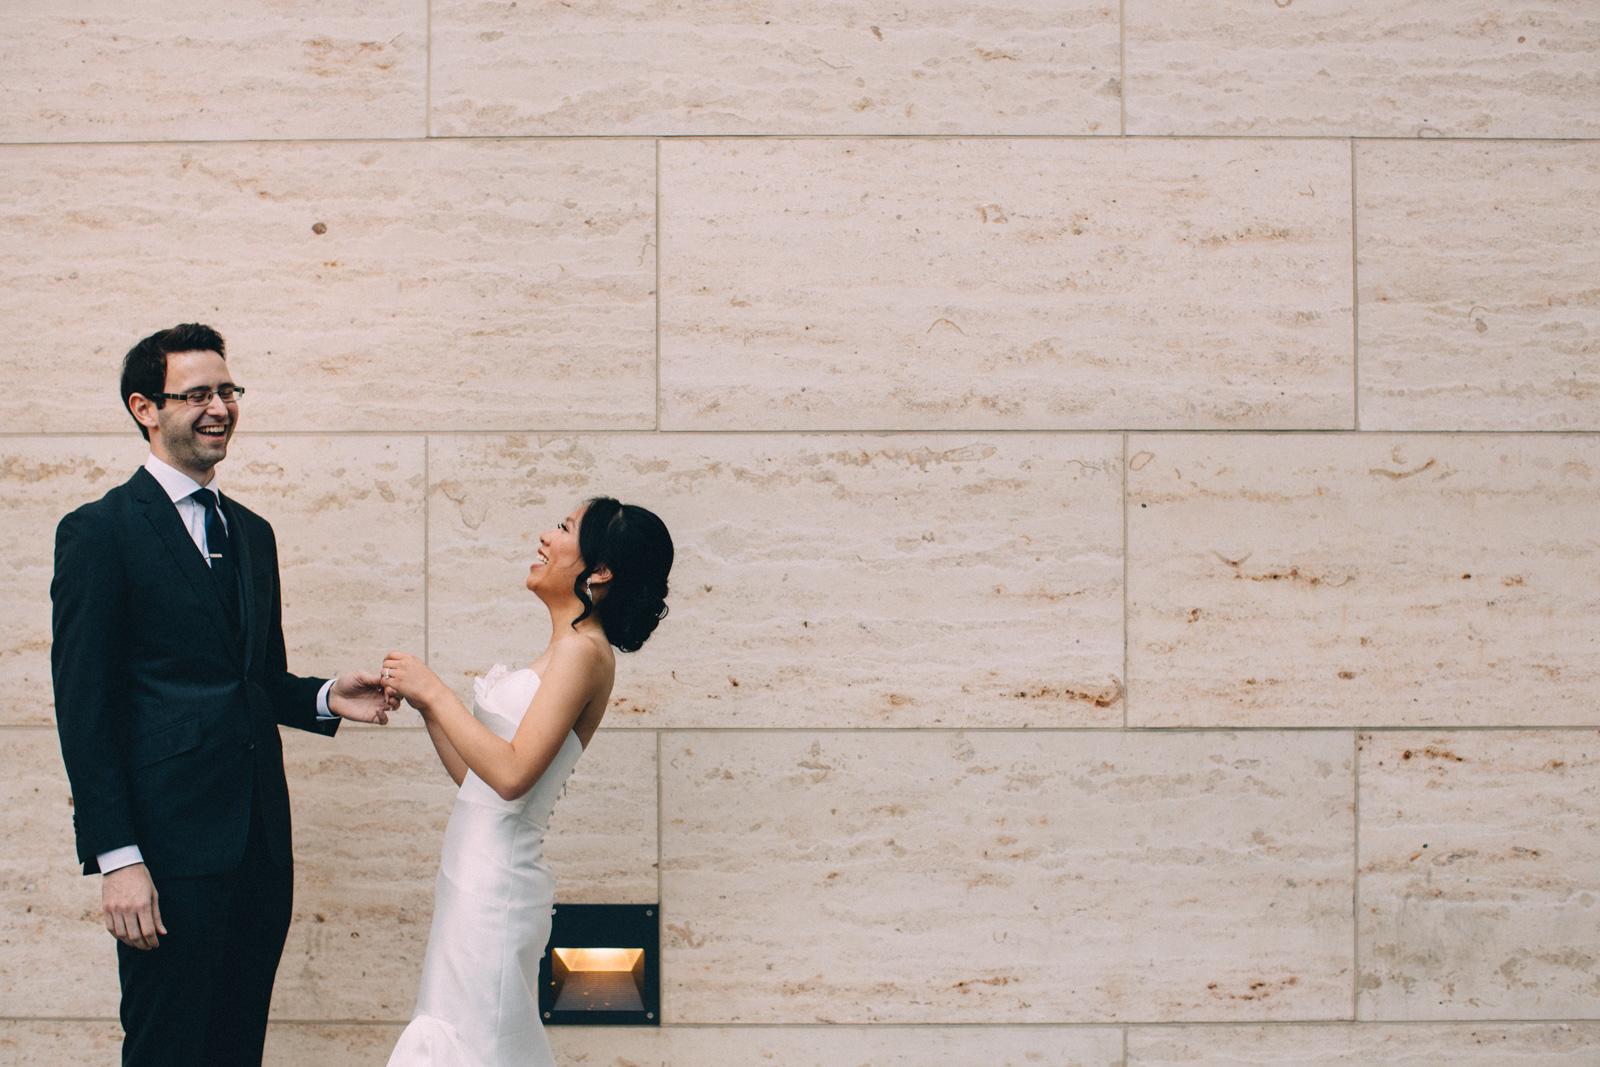 Canoe-Toronto-wedding-photography-JM-by-Sam-Wong-of-visual-cravings_15